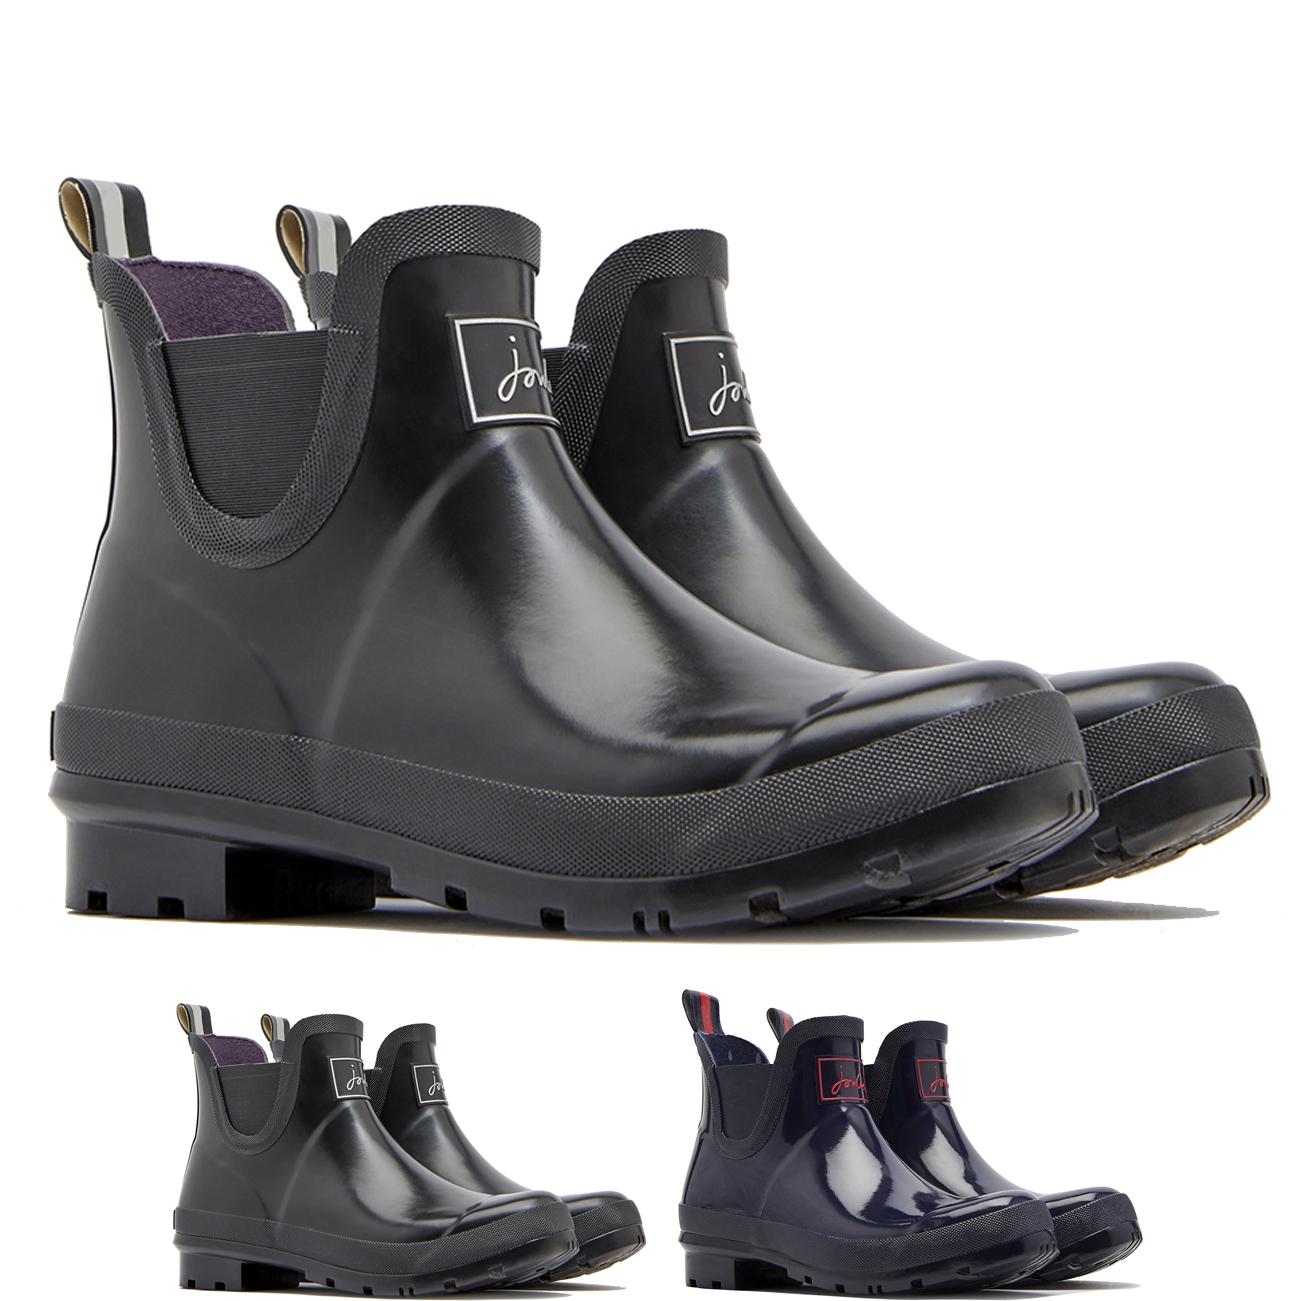 5687c2a74d36 Image is loading Womens-Joules -Wellibobs-Glossy-Waterproof-Rain-Snow-Wellington-